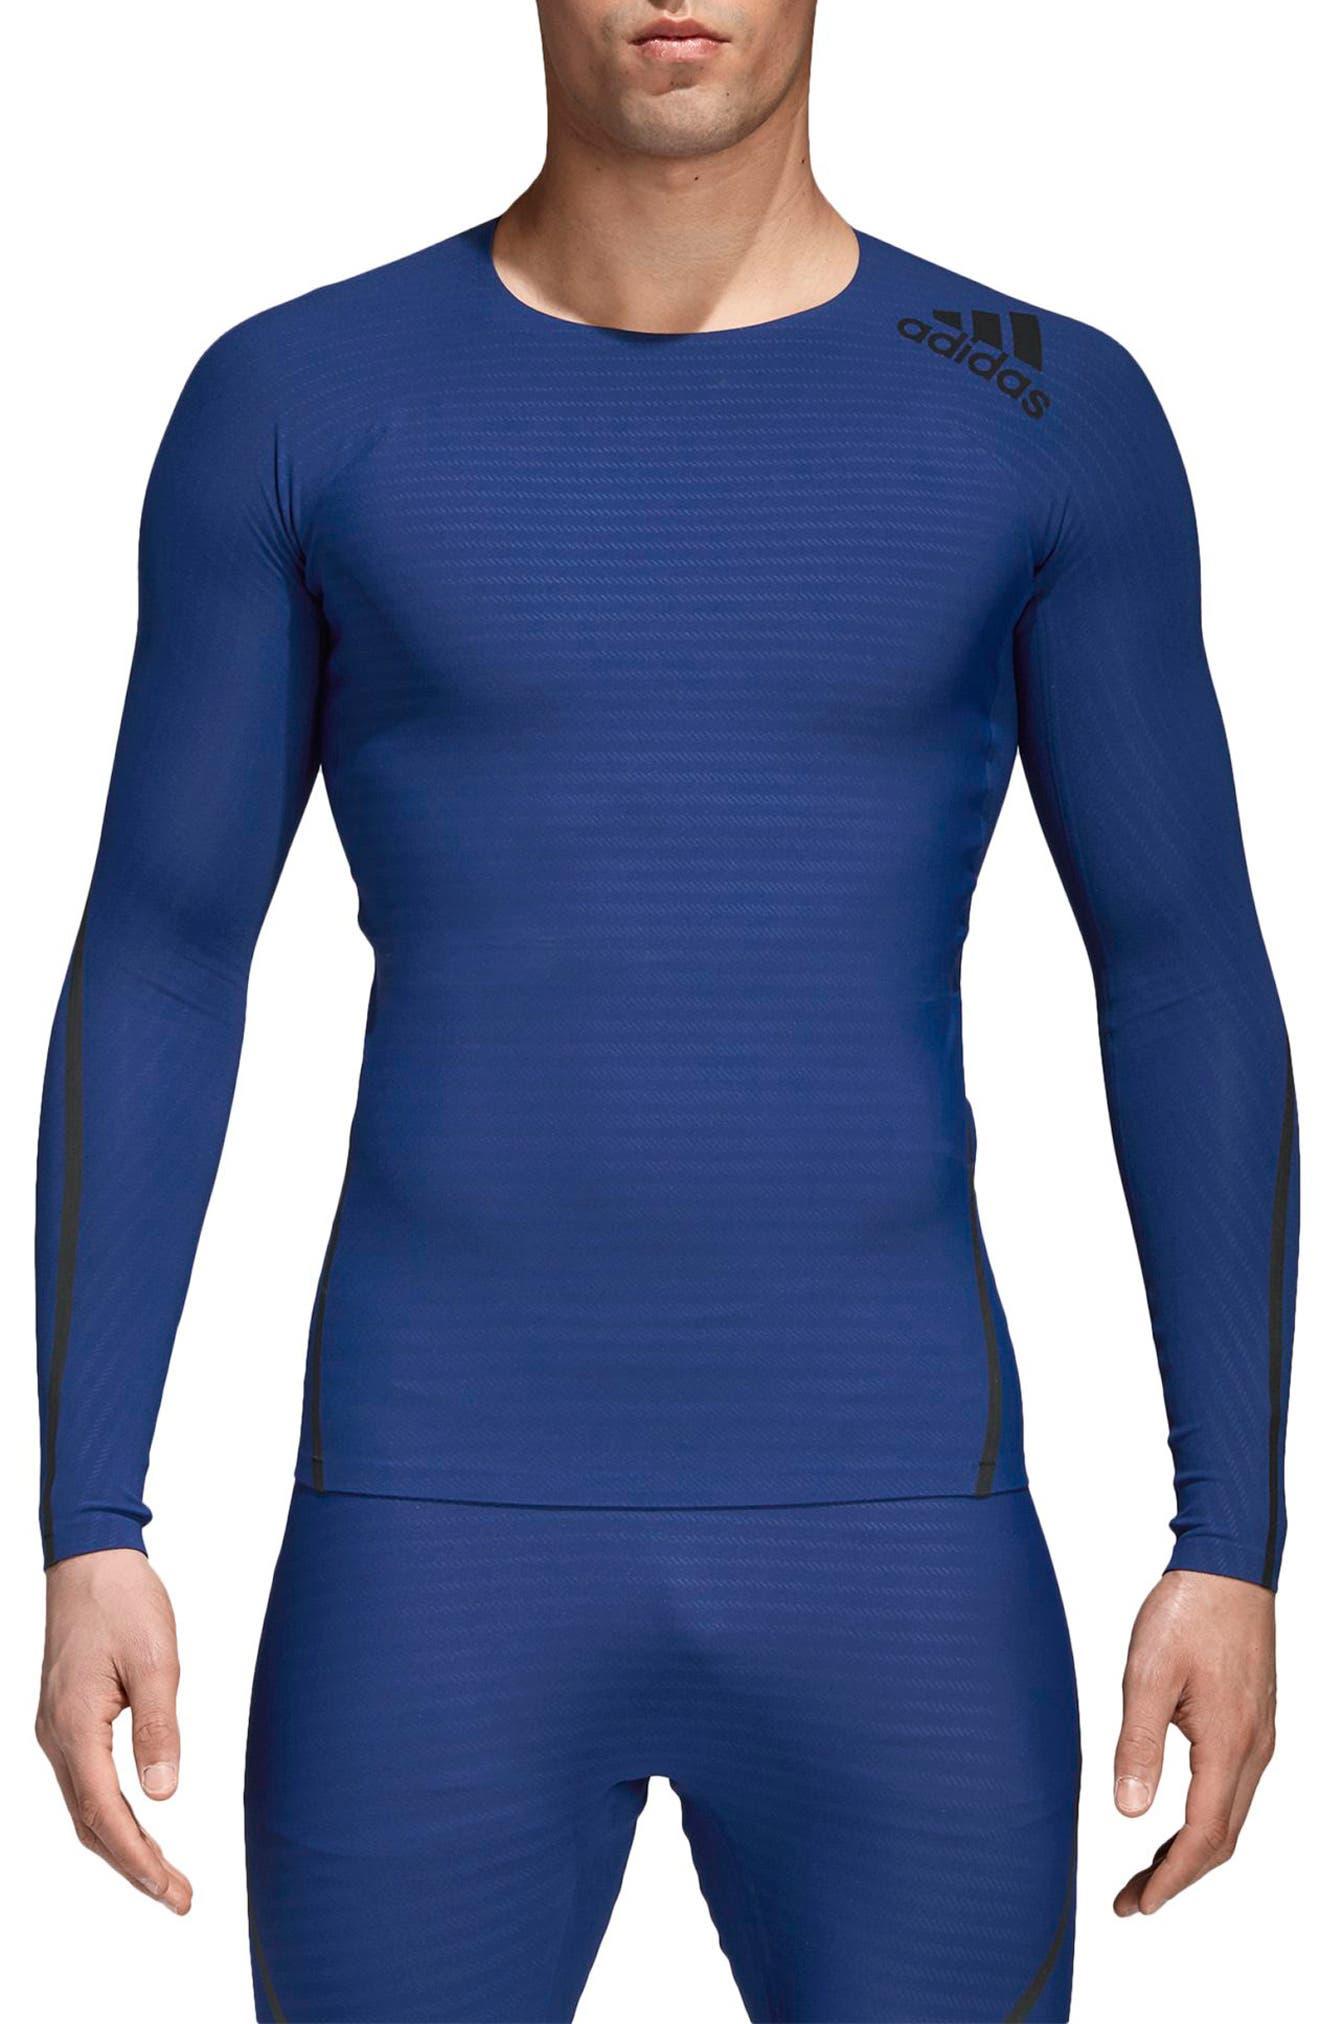 Main Image - adidas Alphaskin 360 Long Sleeve T-Shirt